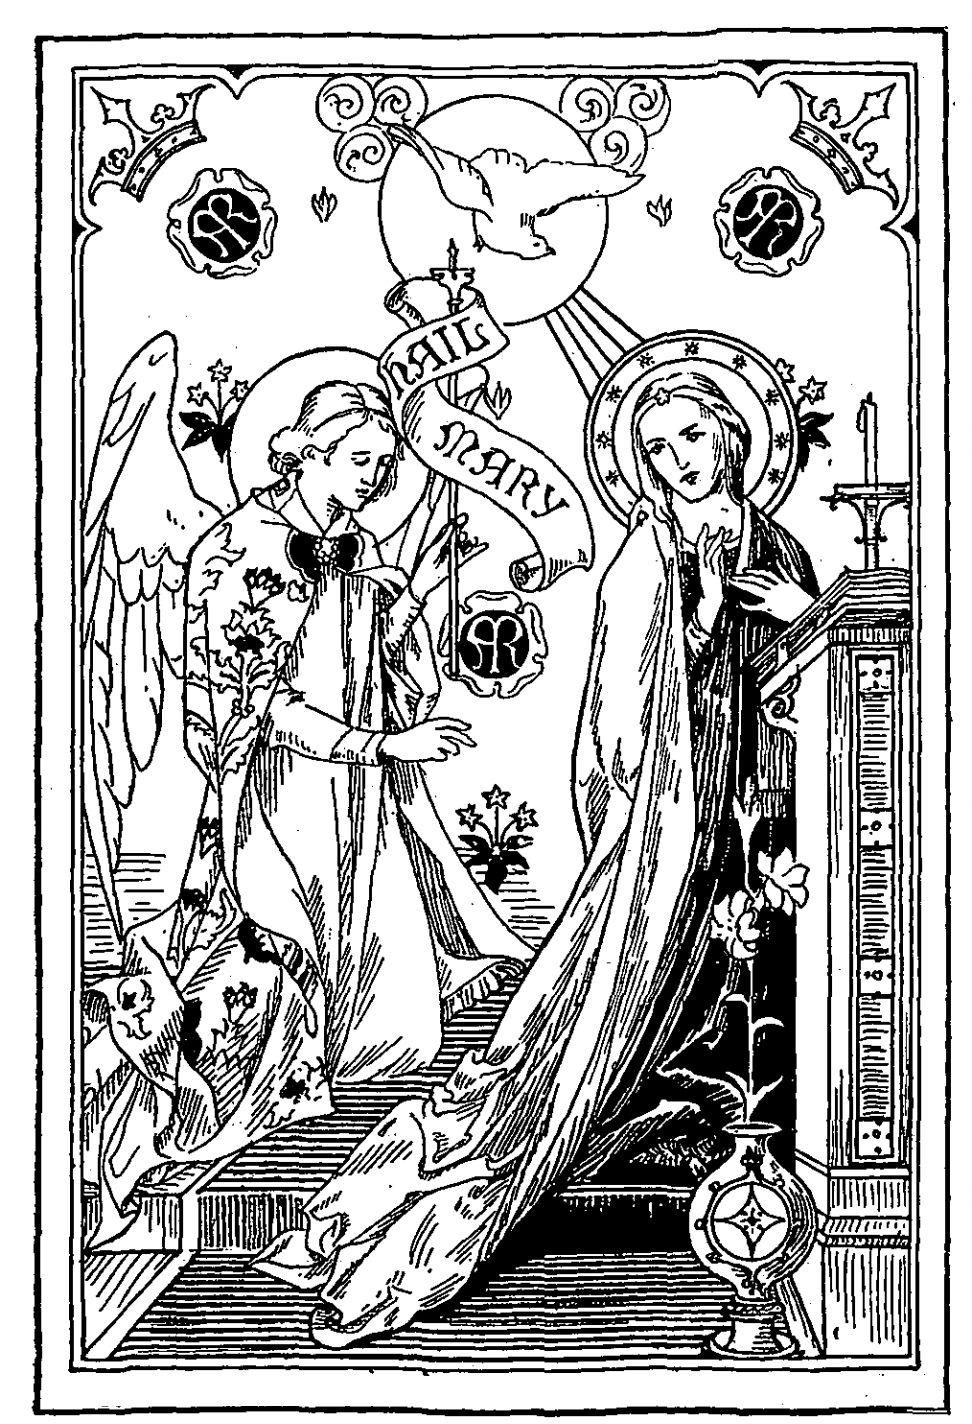 Pin de Gabriel Zavitoski en Missal Art | Pinterest | Religiosas ...